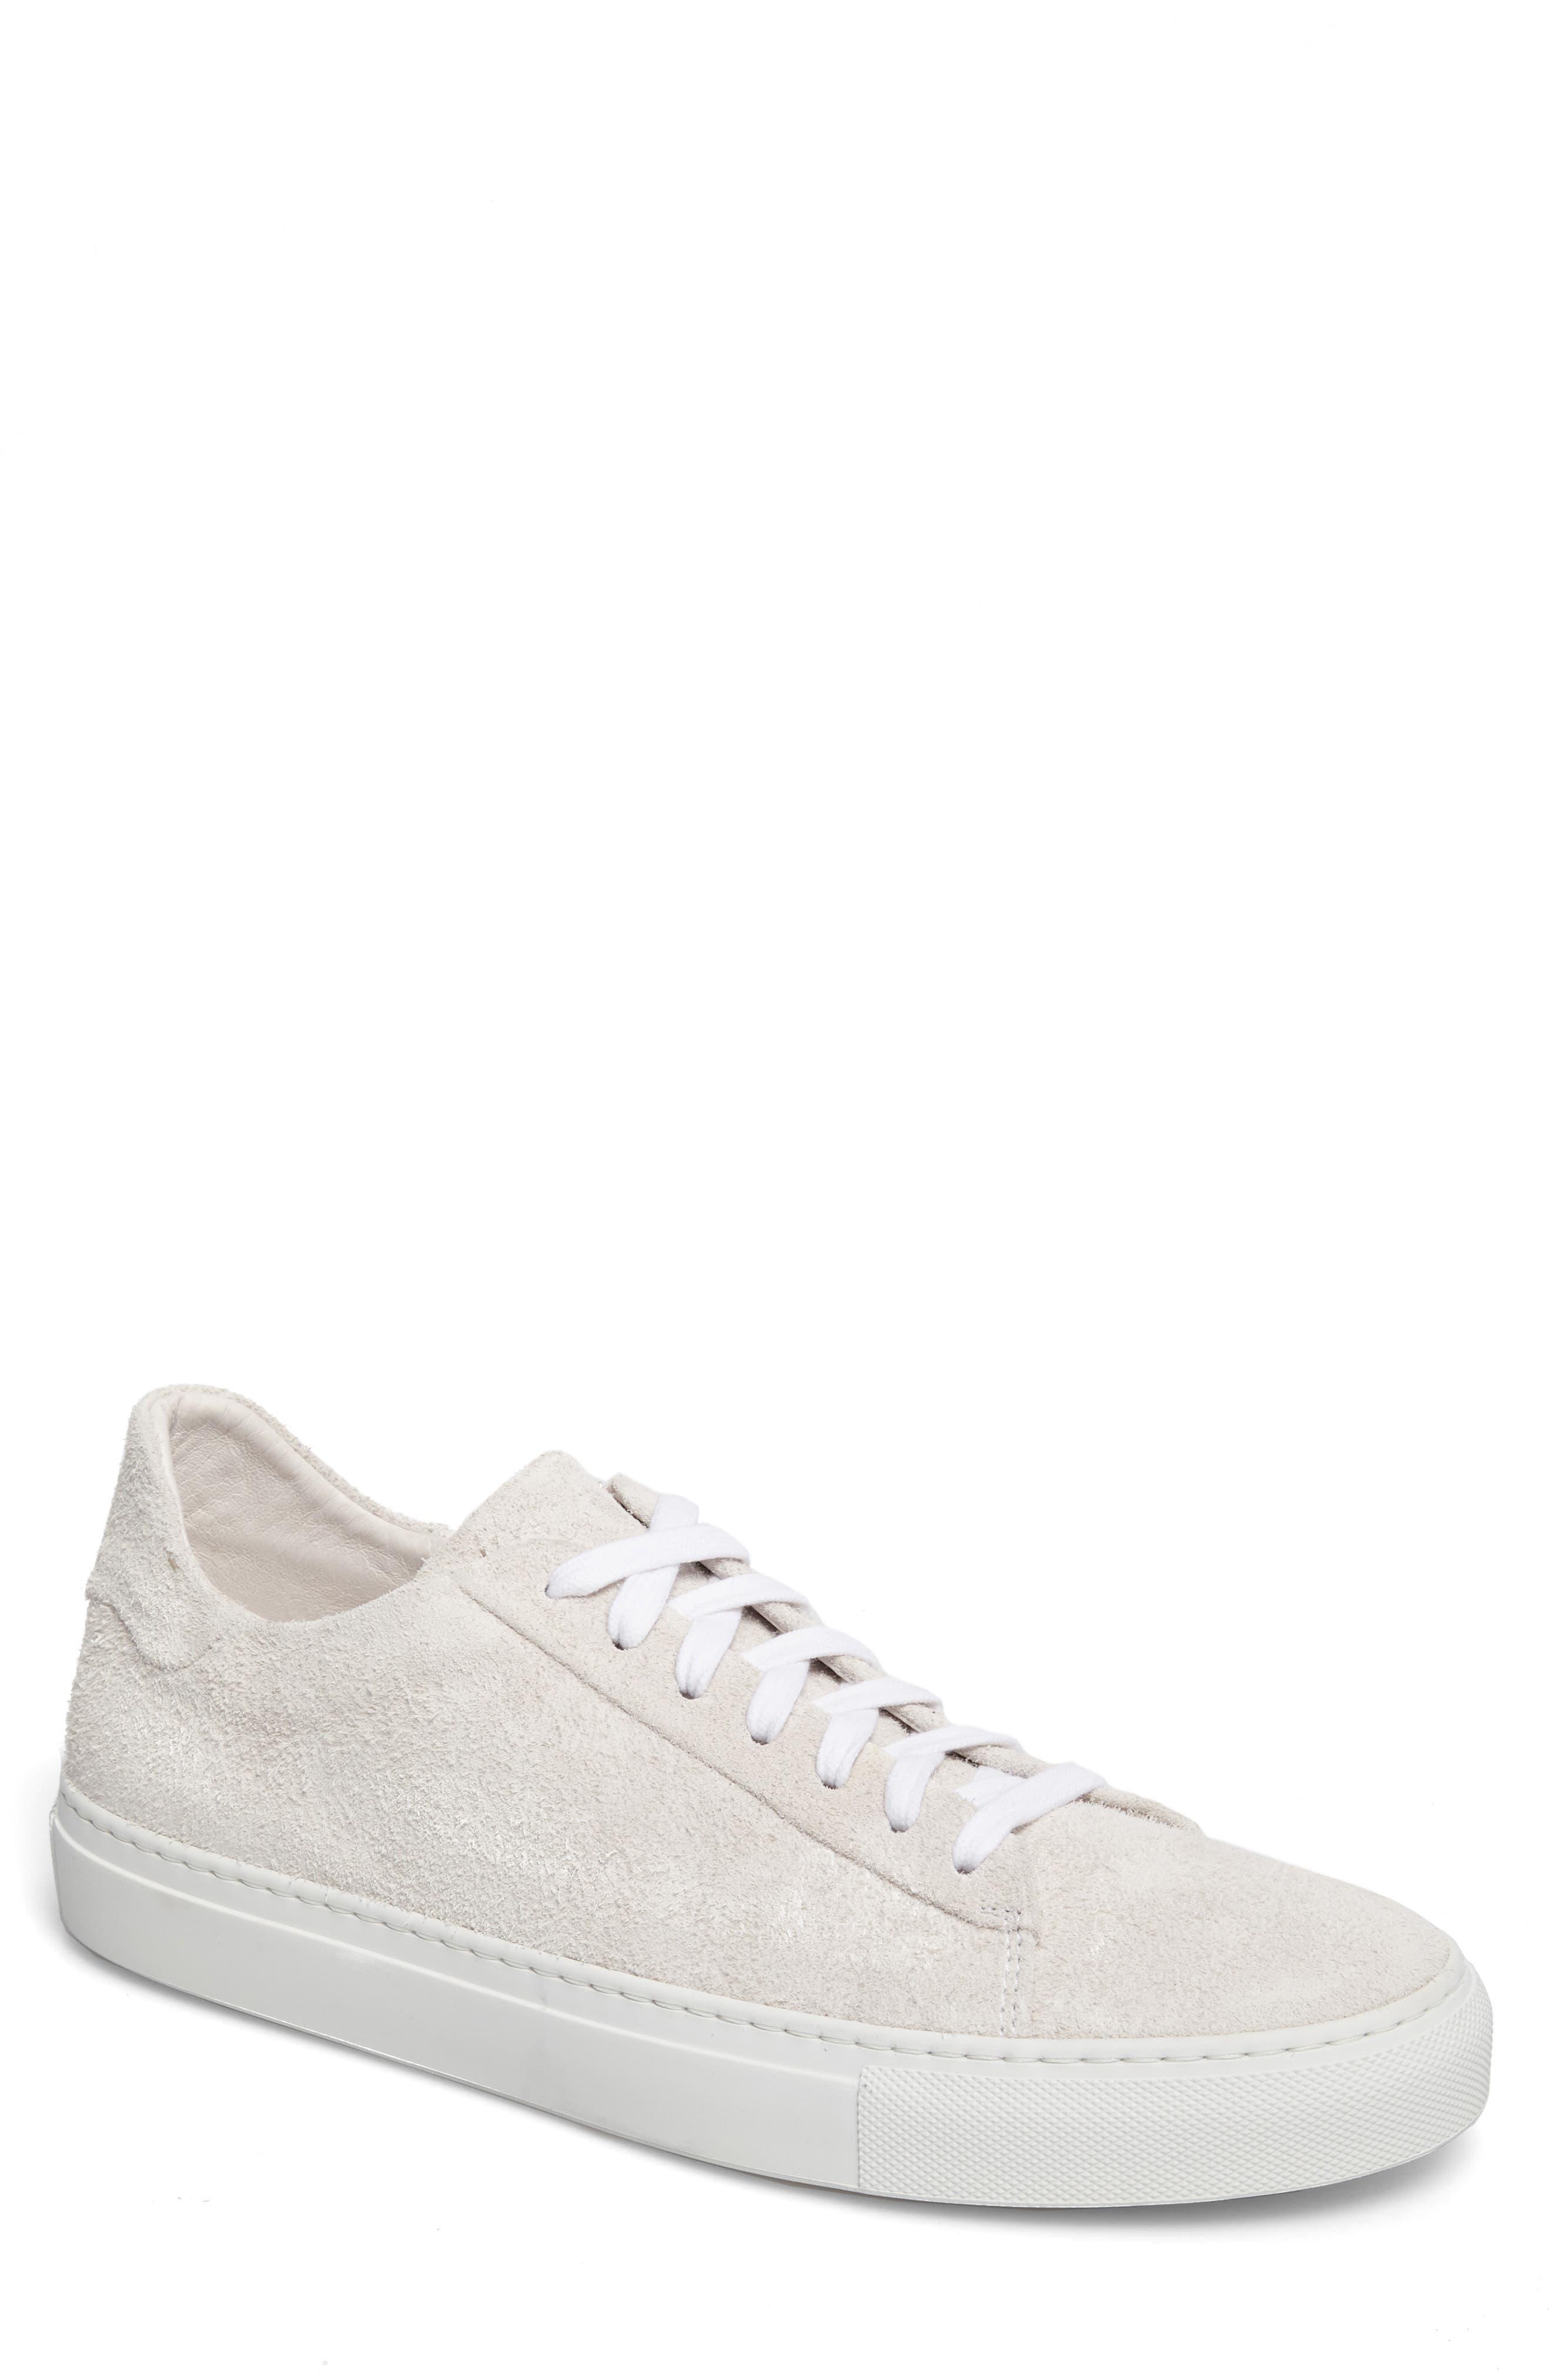 Court Sneaker,                         Main,                         color, 113